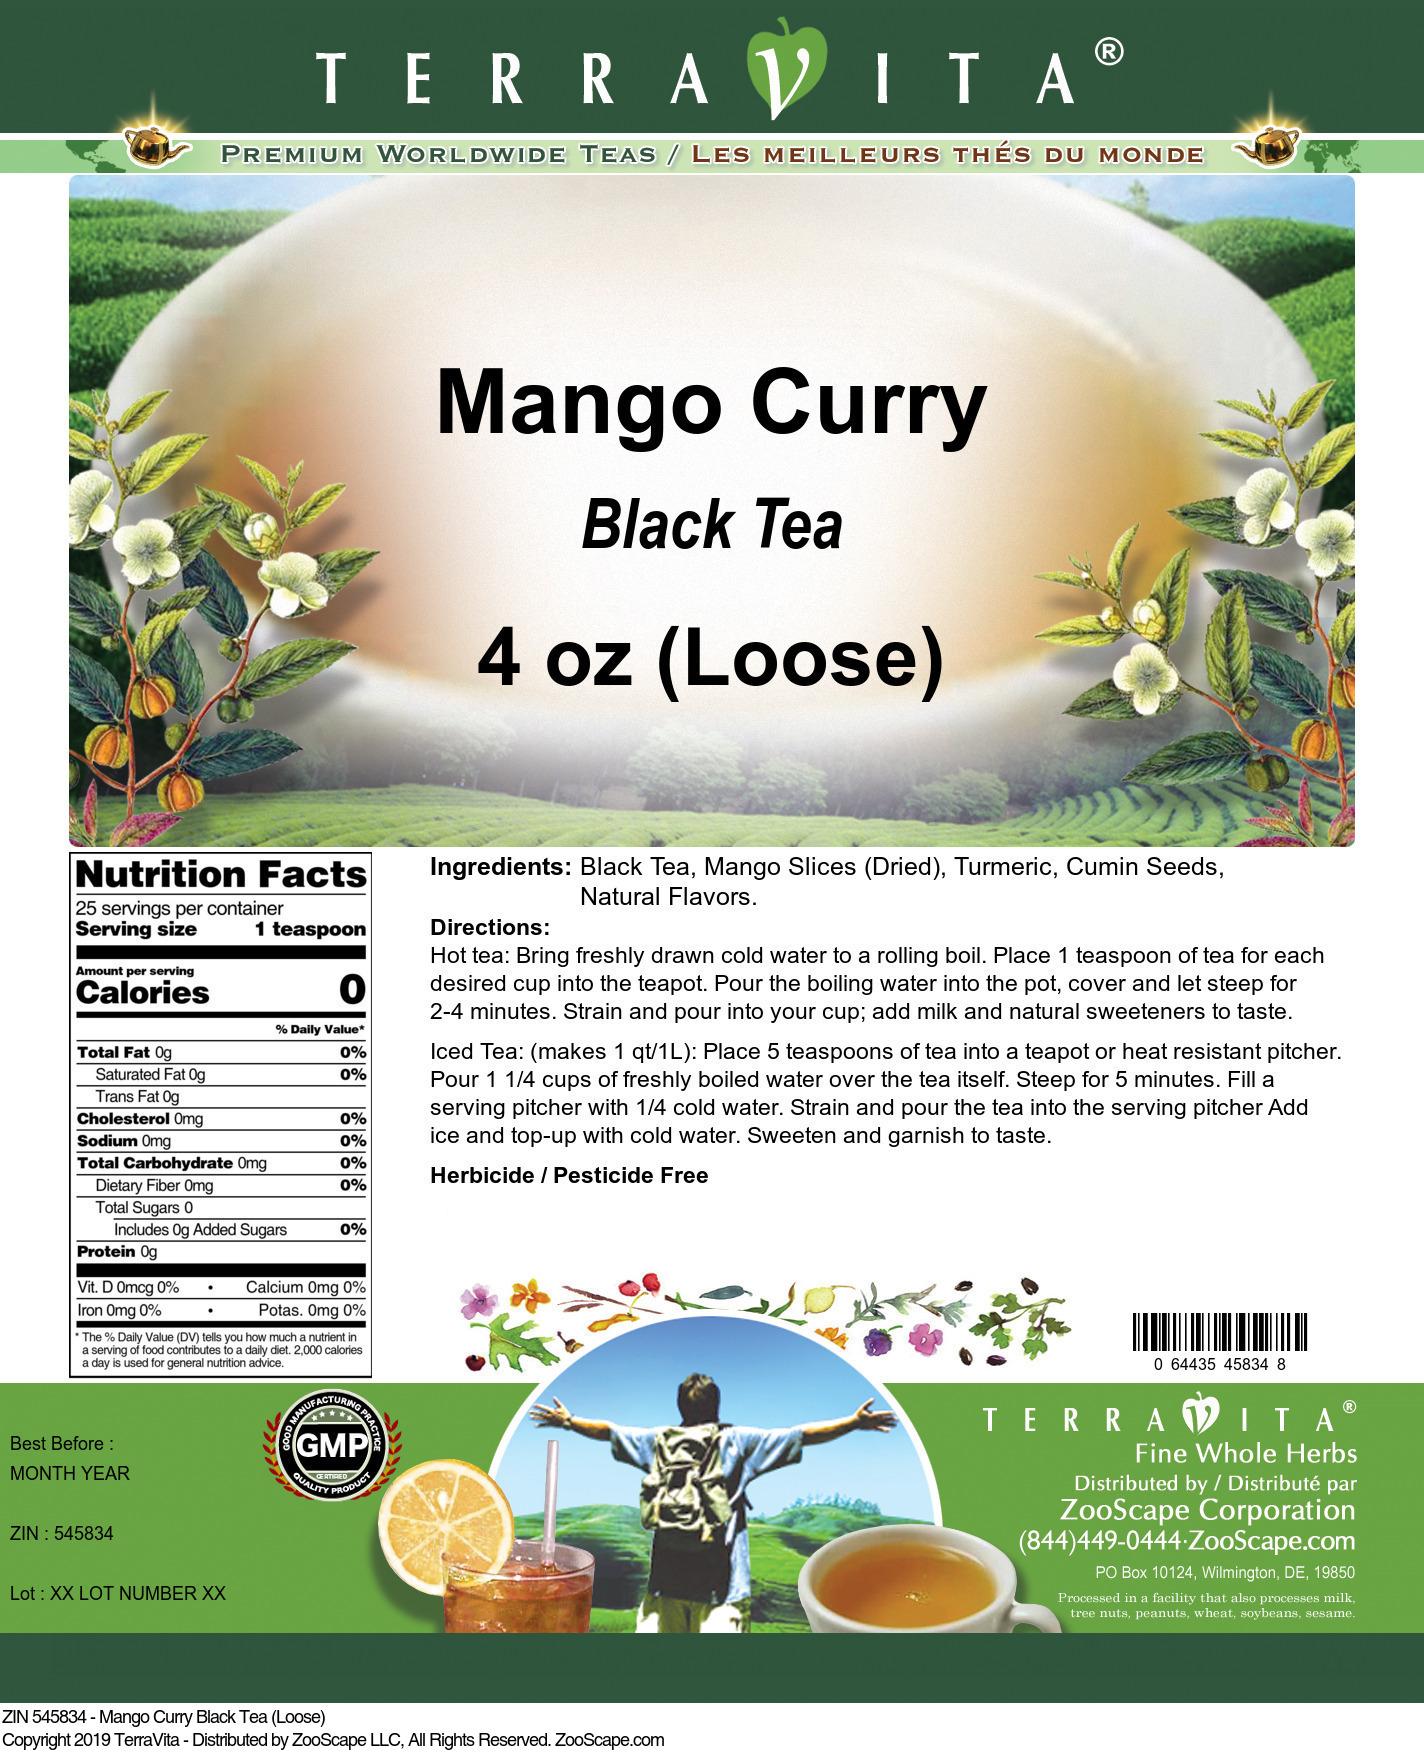 Mango Curry Black Tea (Loose)